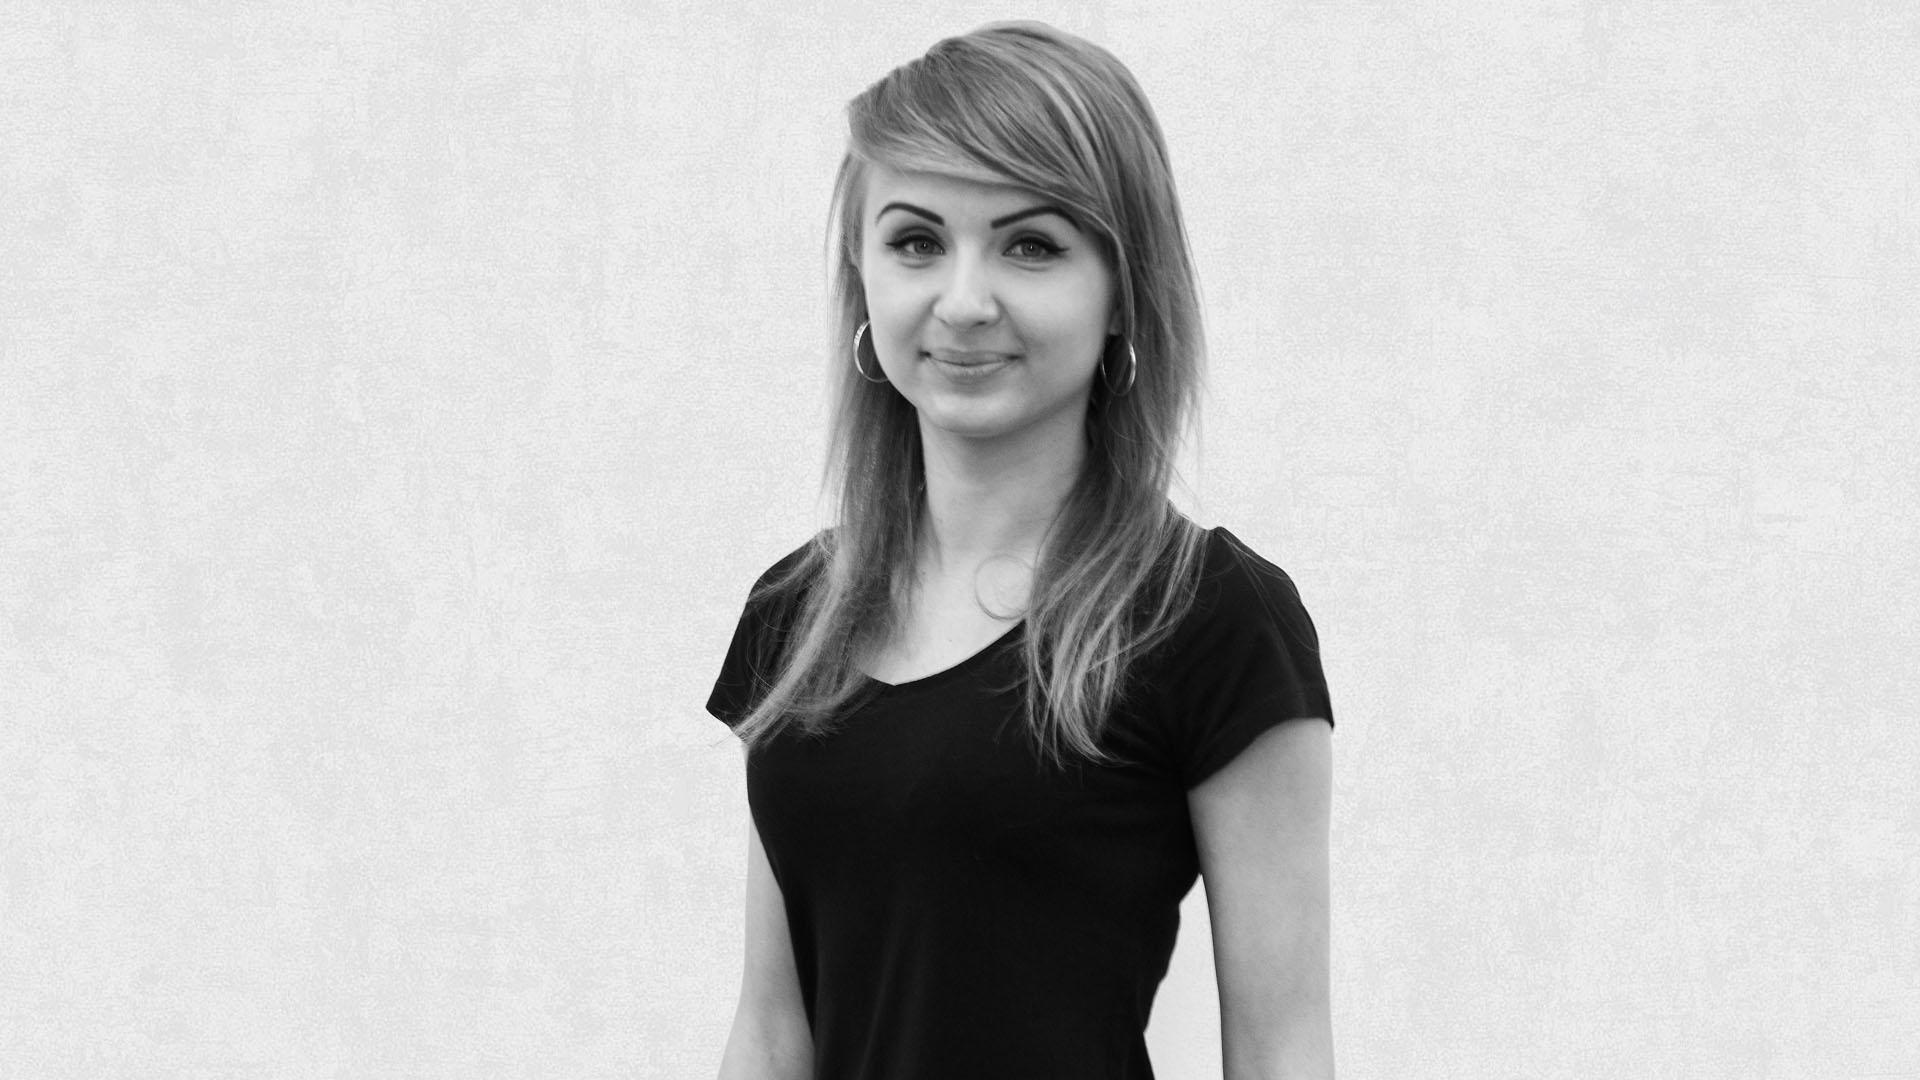 Katarzyna Gumulak